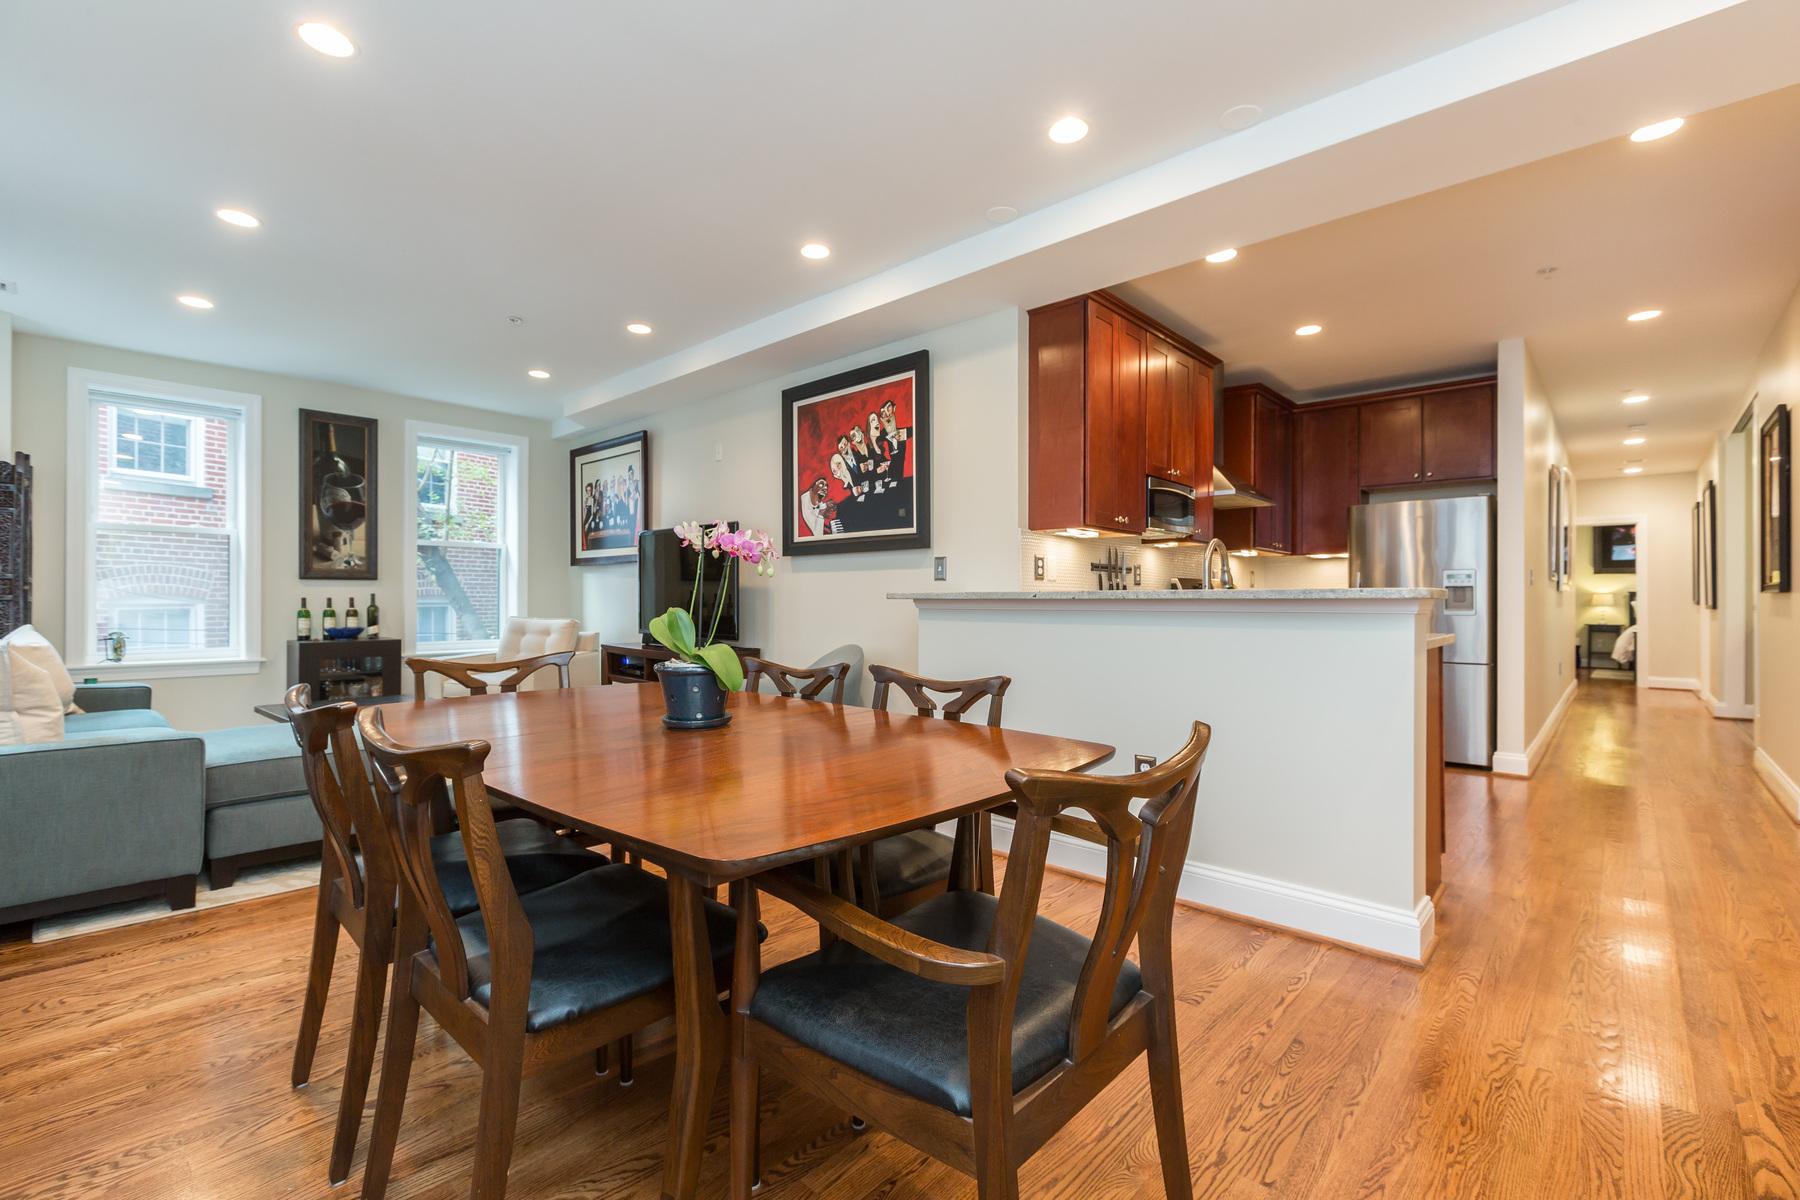 Condominium for Sale at NW DC: Kalorama 1840 Vernon Street Nw 203 Washington, District Of Columbia 20009 United States